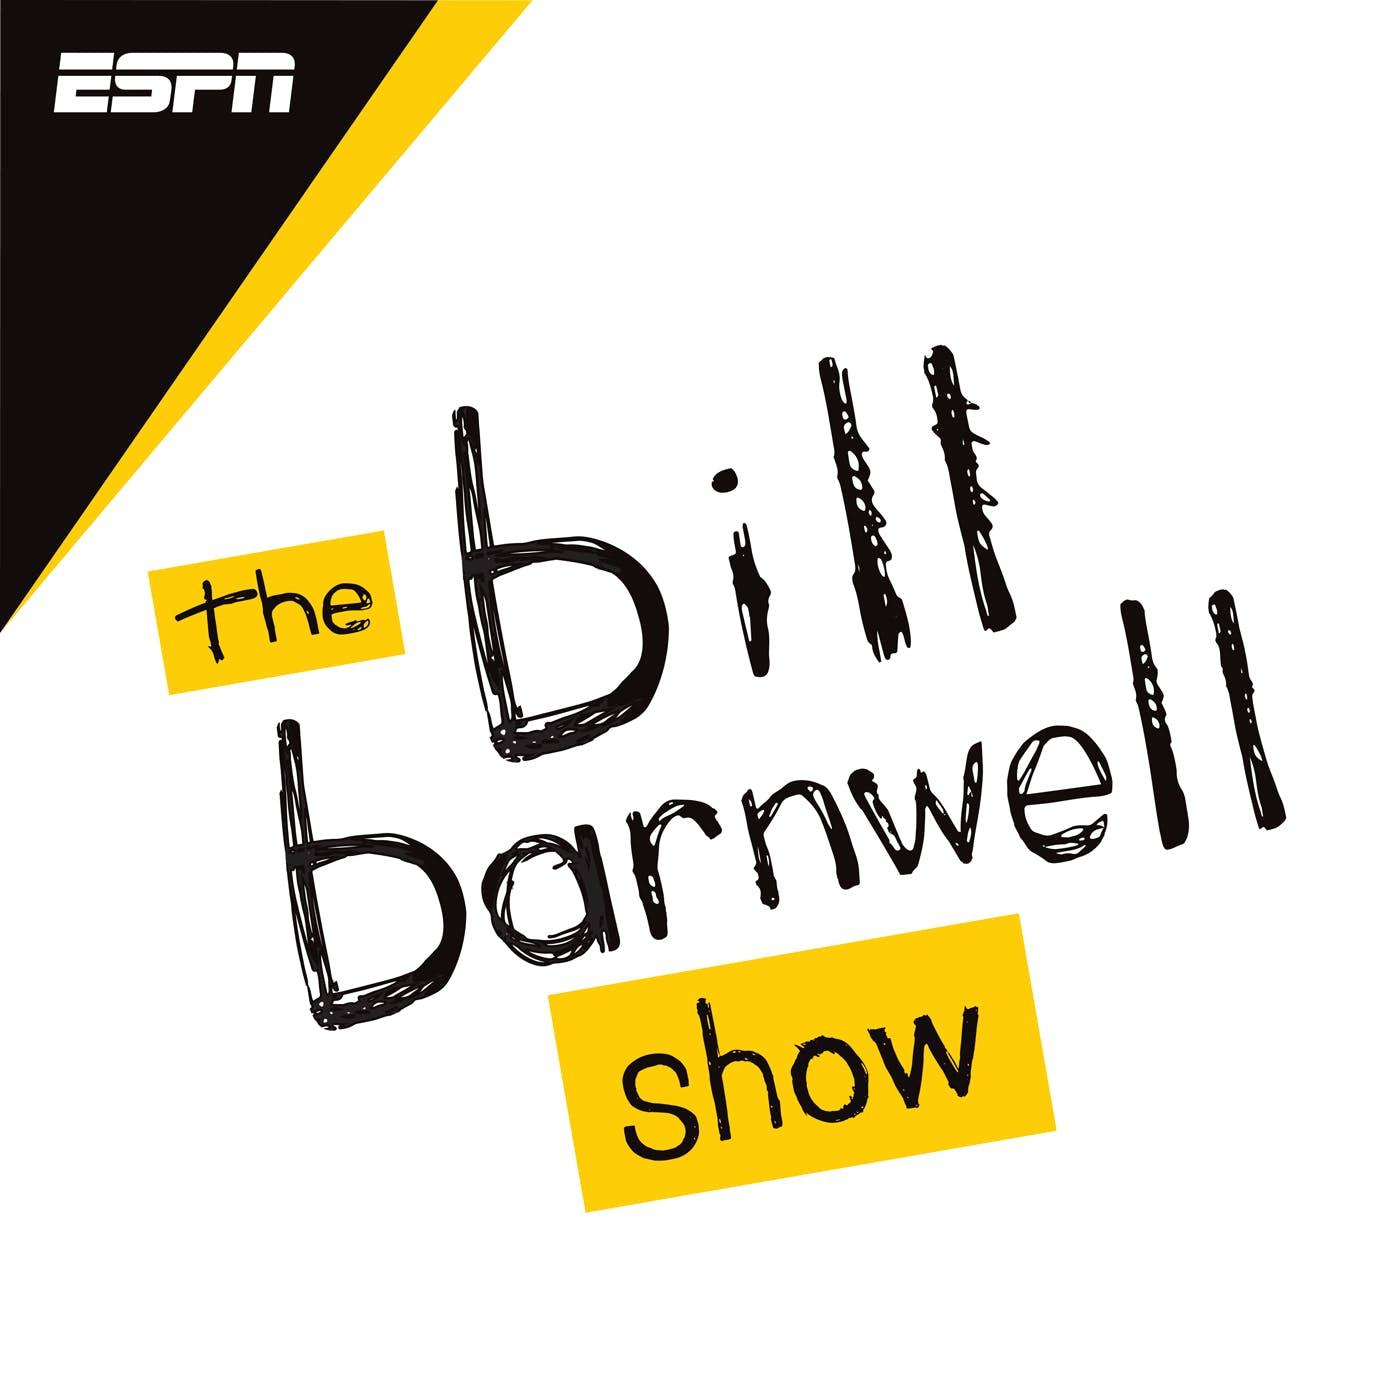 The Bill Barnwell Show